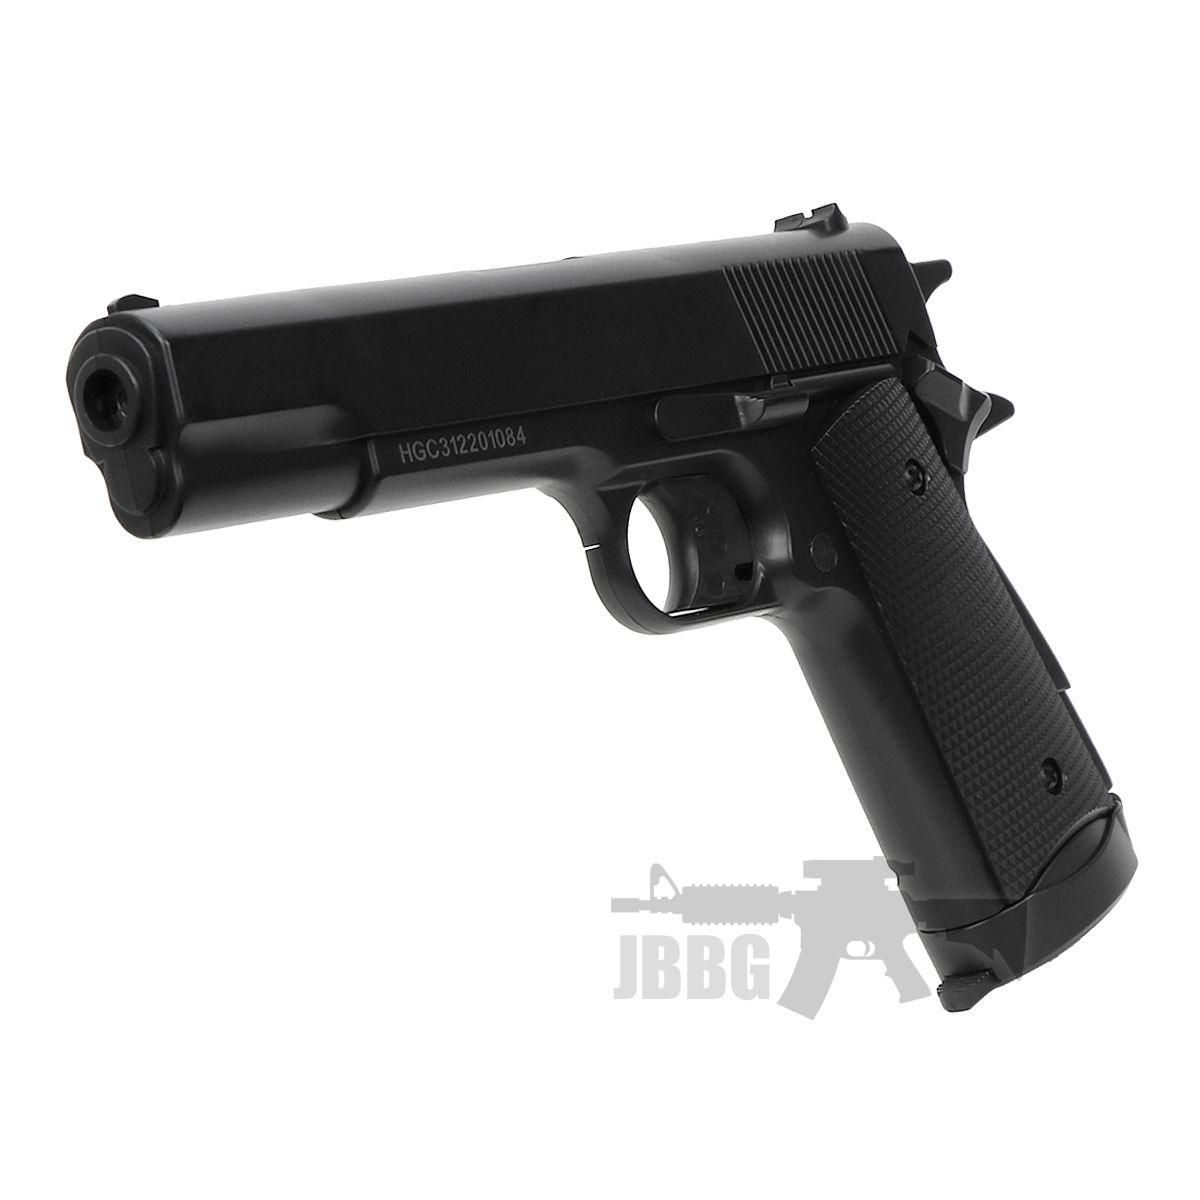 hgc312 airsoft gas pistol jbbg 6